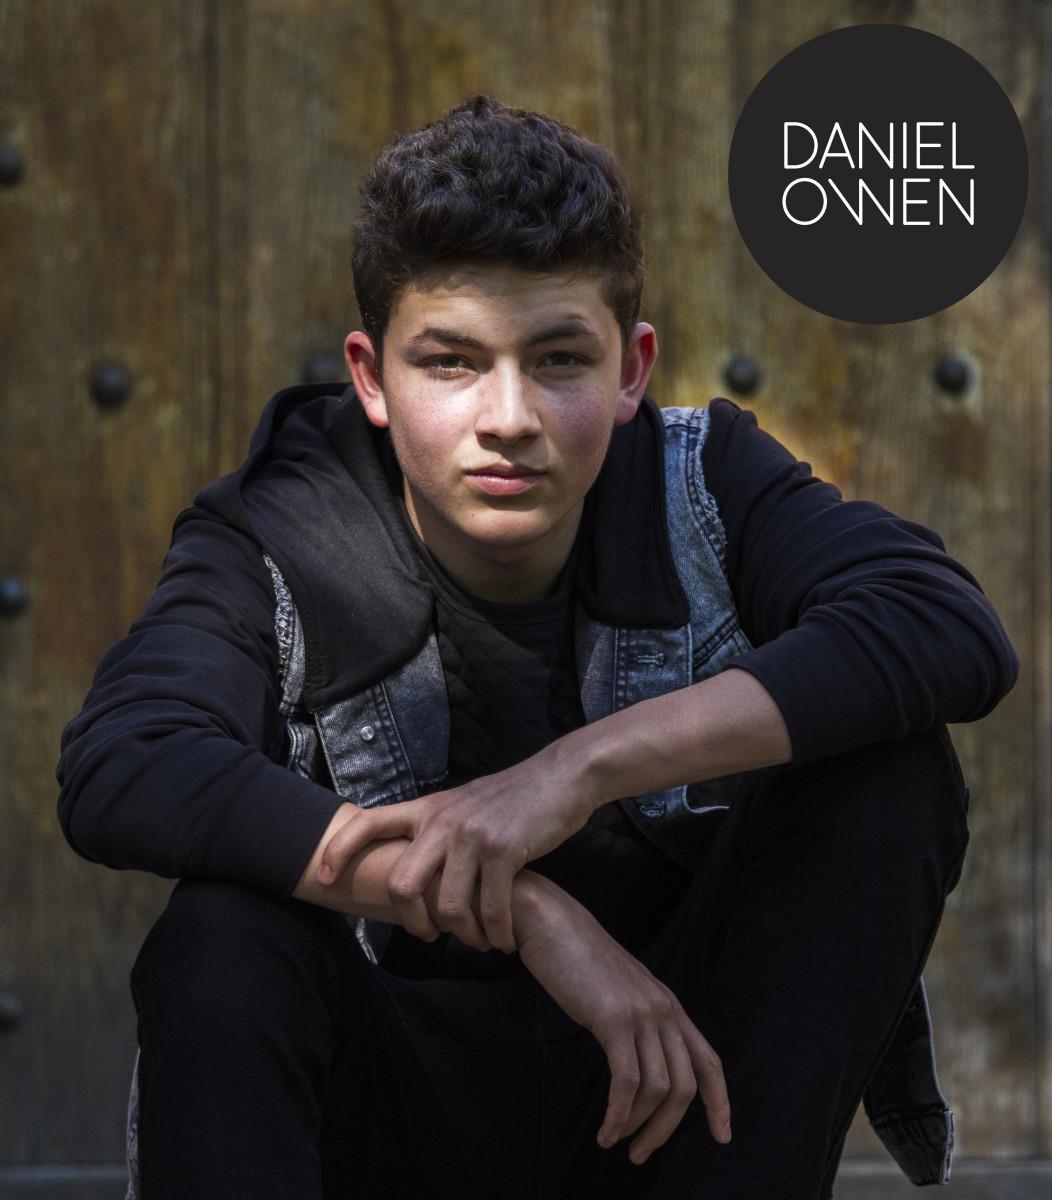 Daniel Owen - Promopic 1